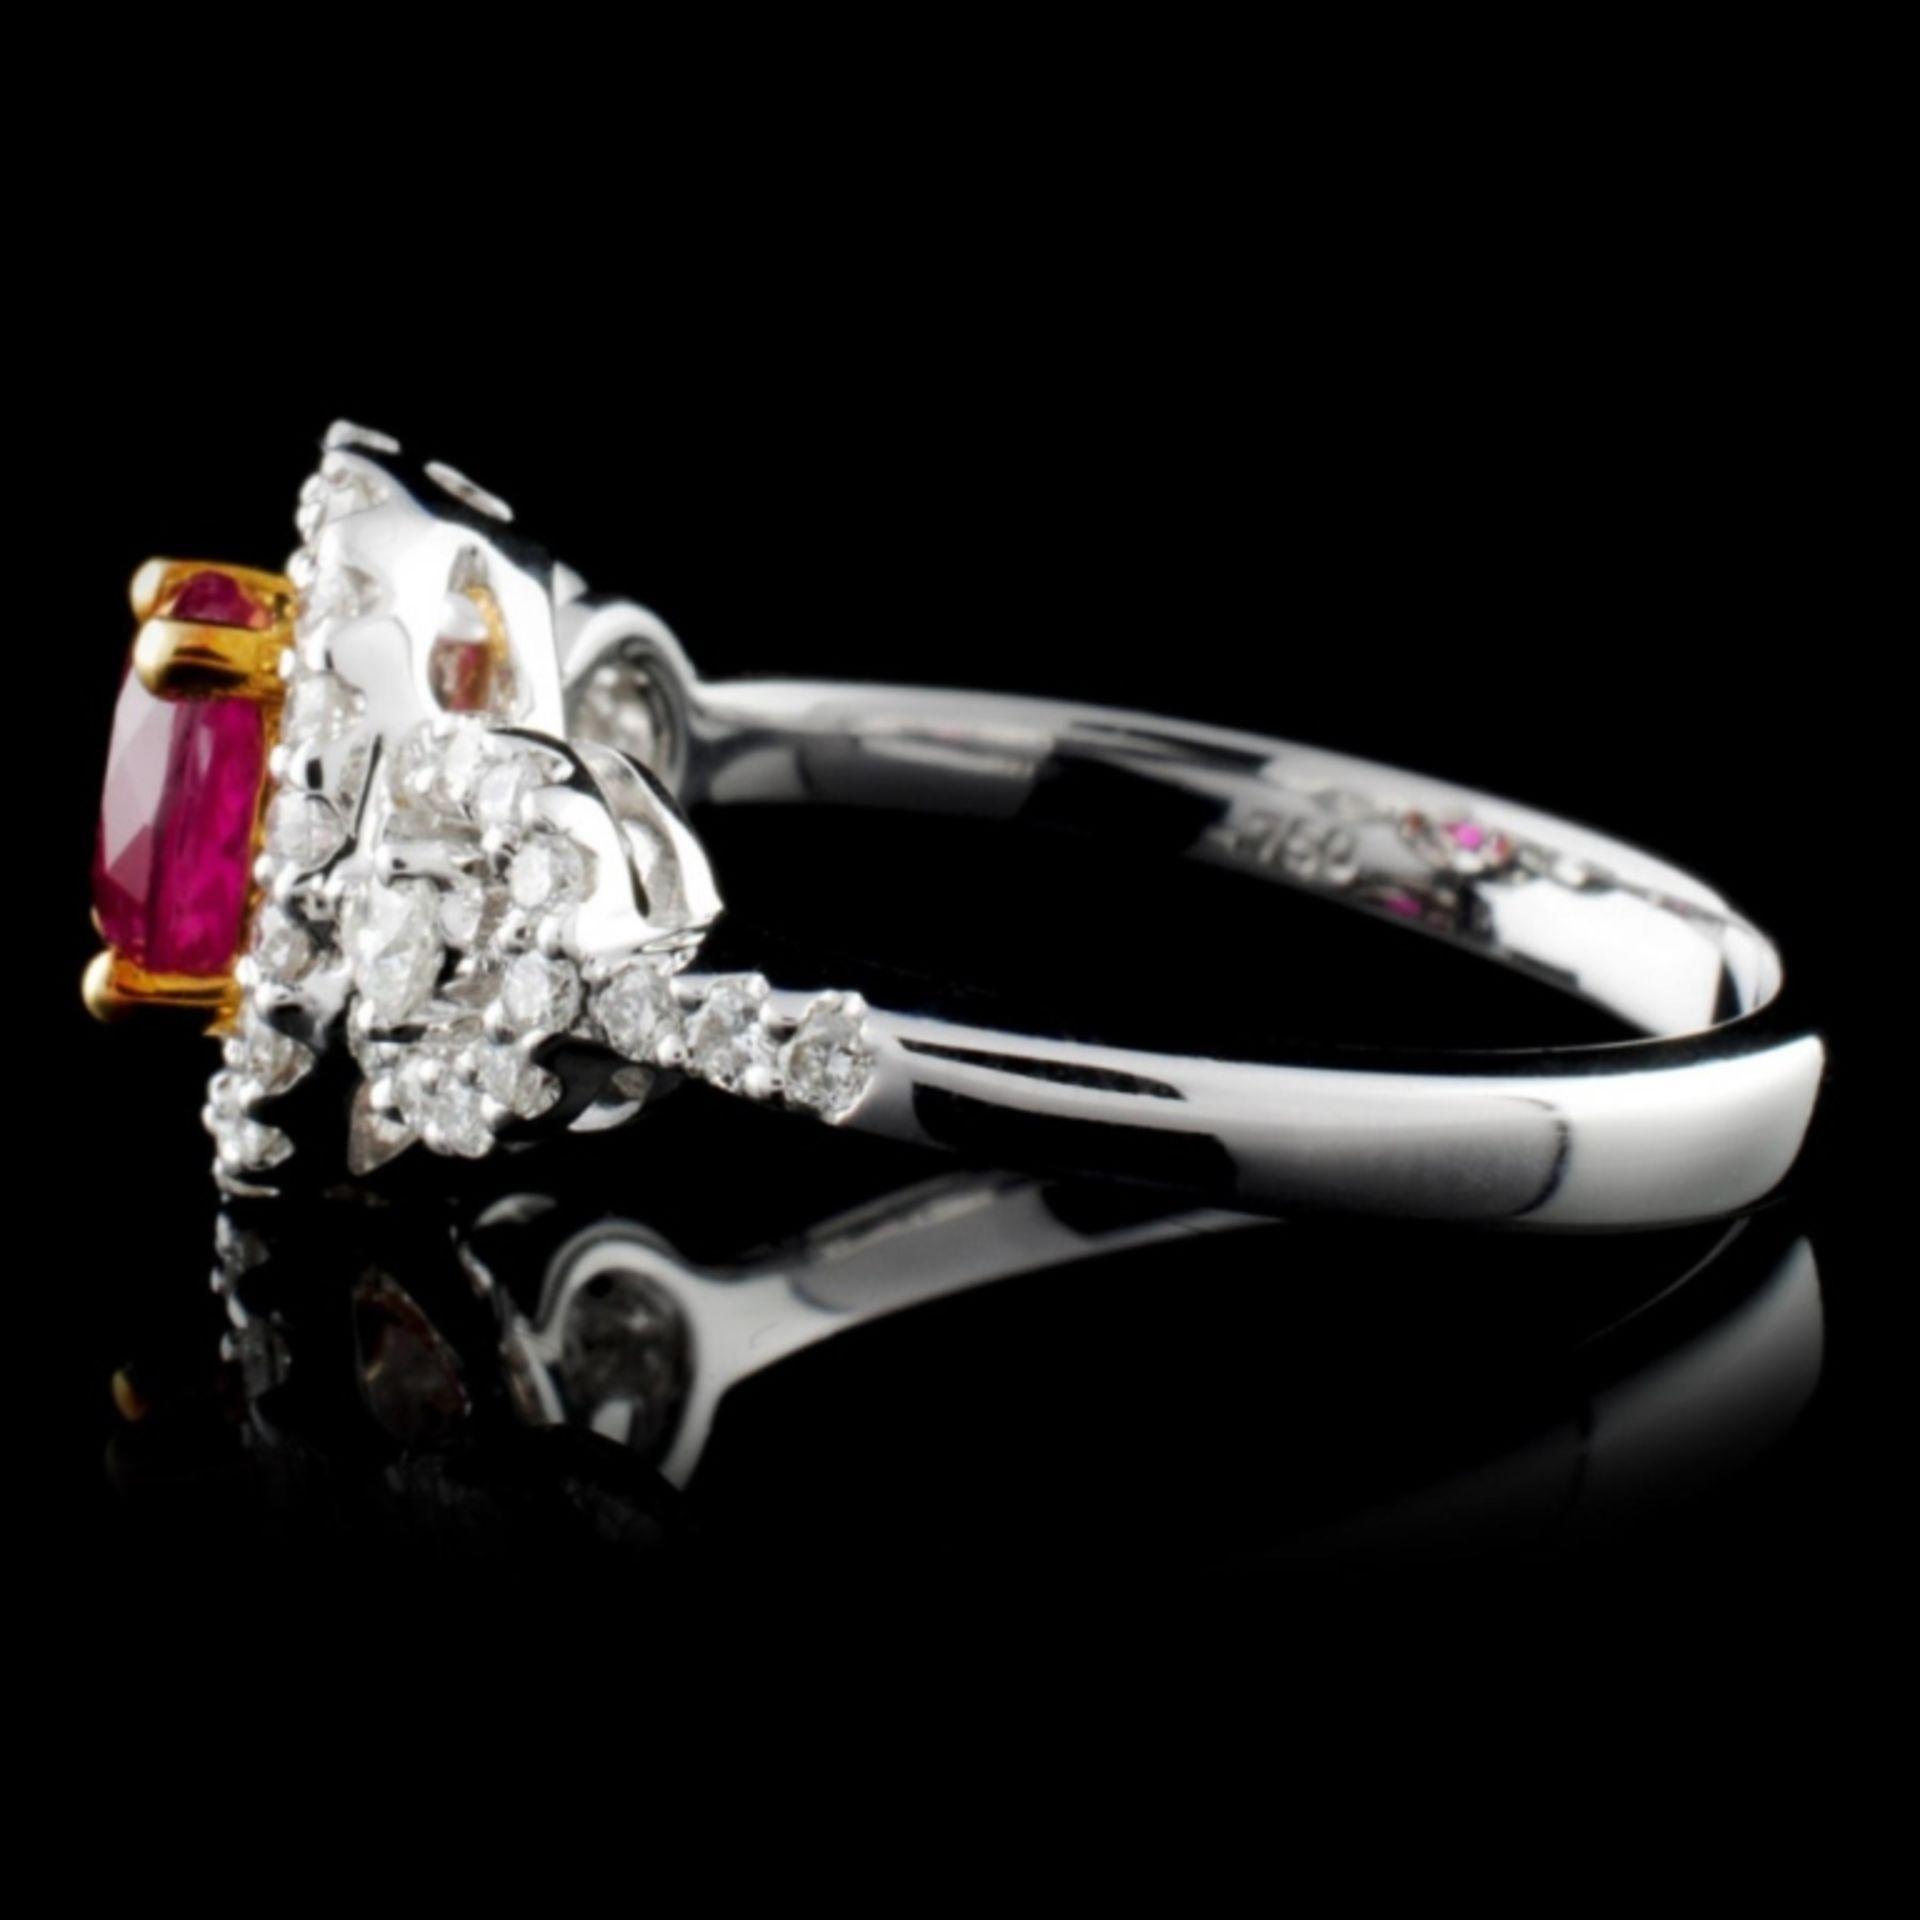 18K White Gold 0.98ct Ruby & 0.50ct Diamond Ring - Image 3 of 4